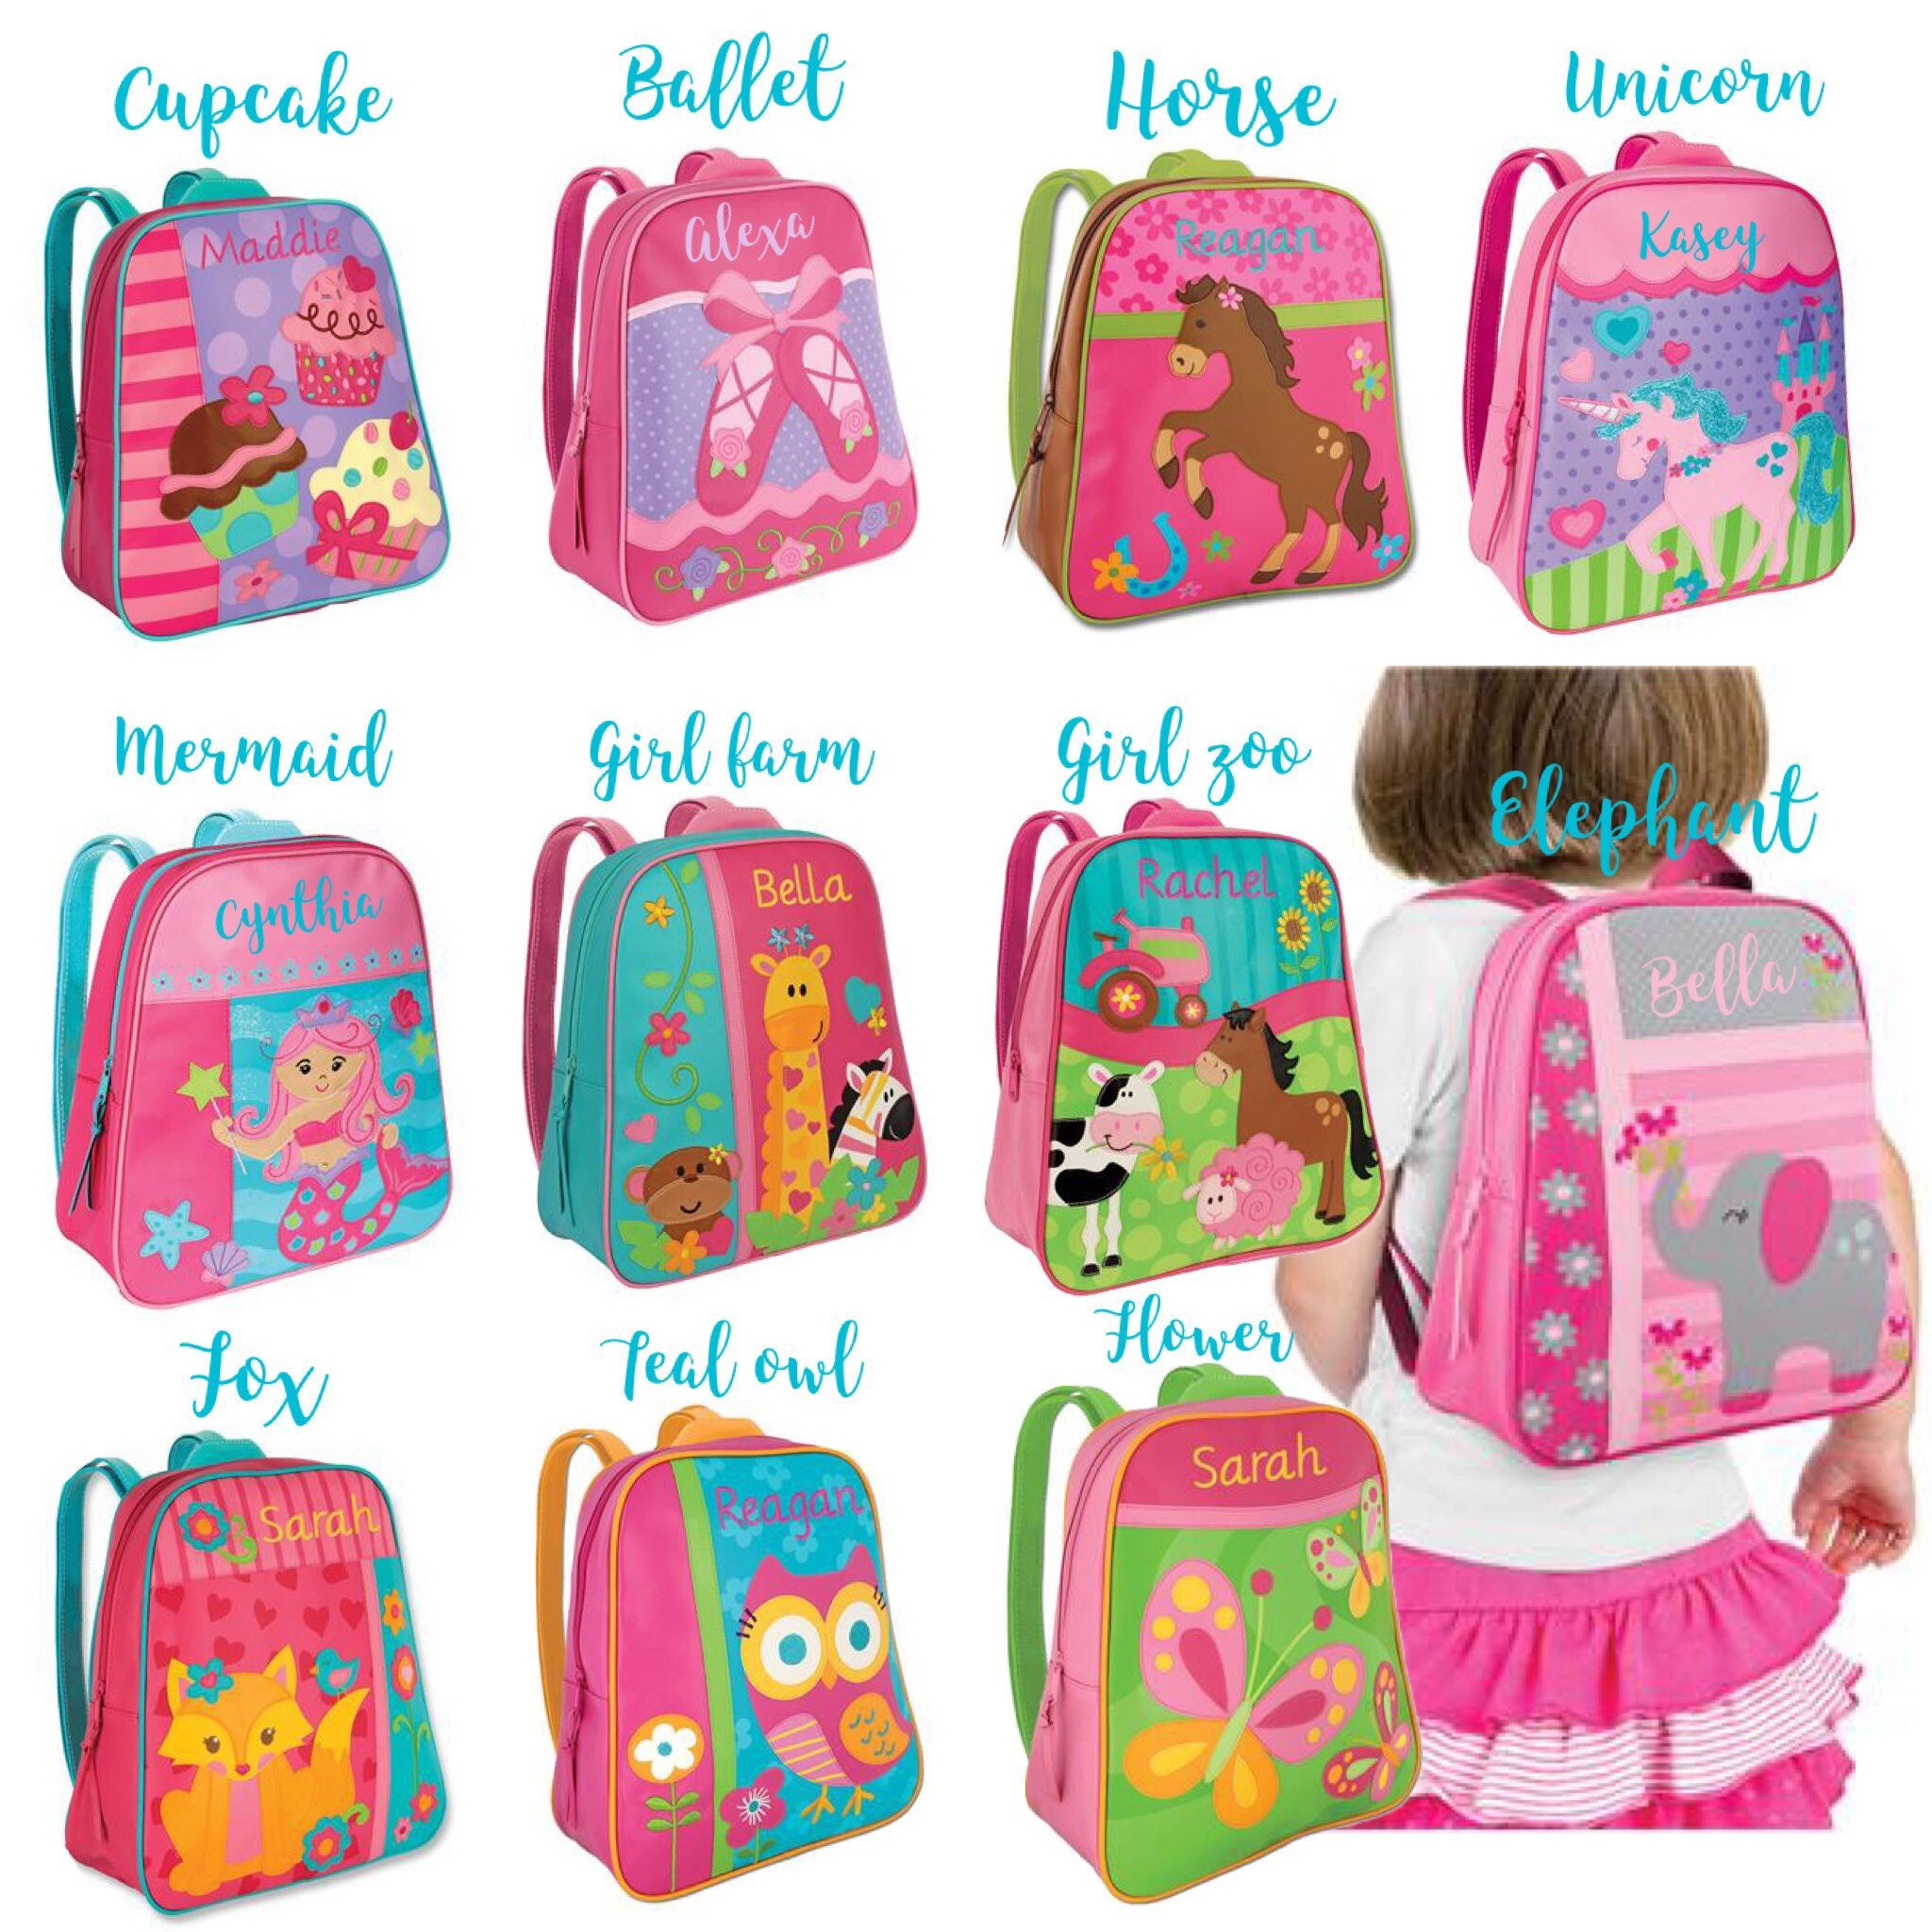 Go-Go Toddler backpack ,kids backpack , preschool